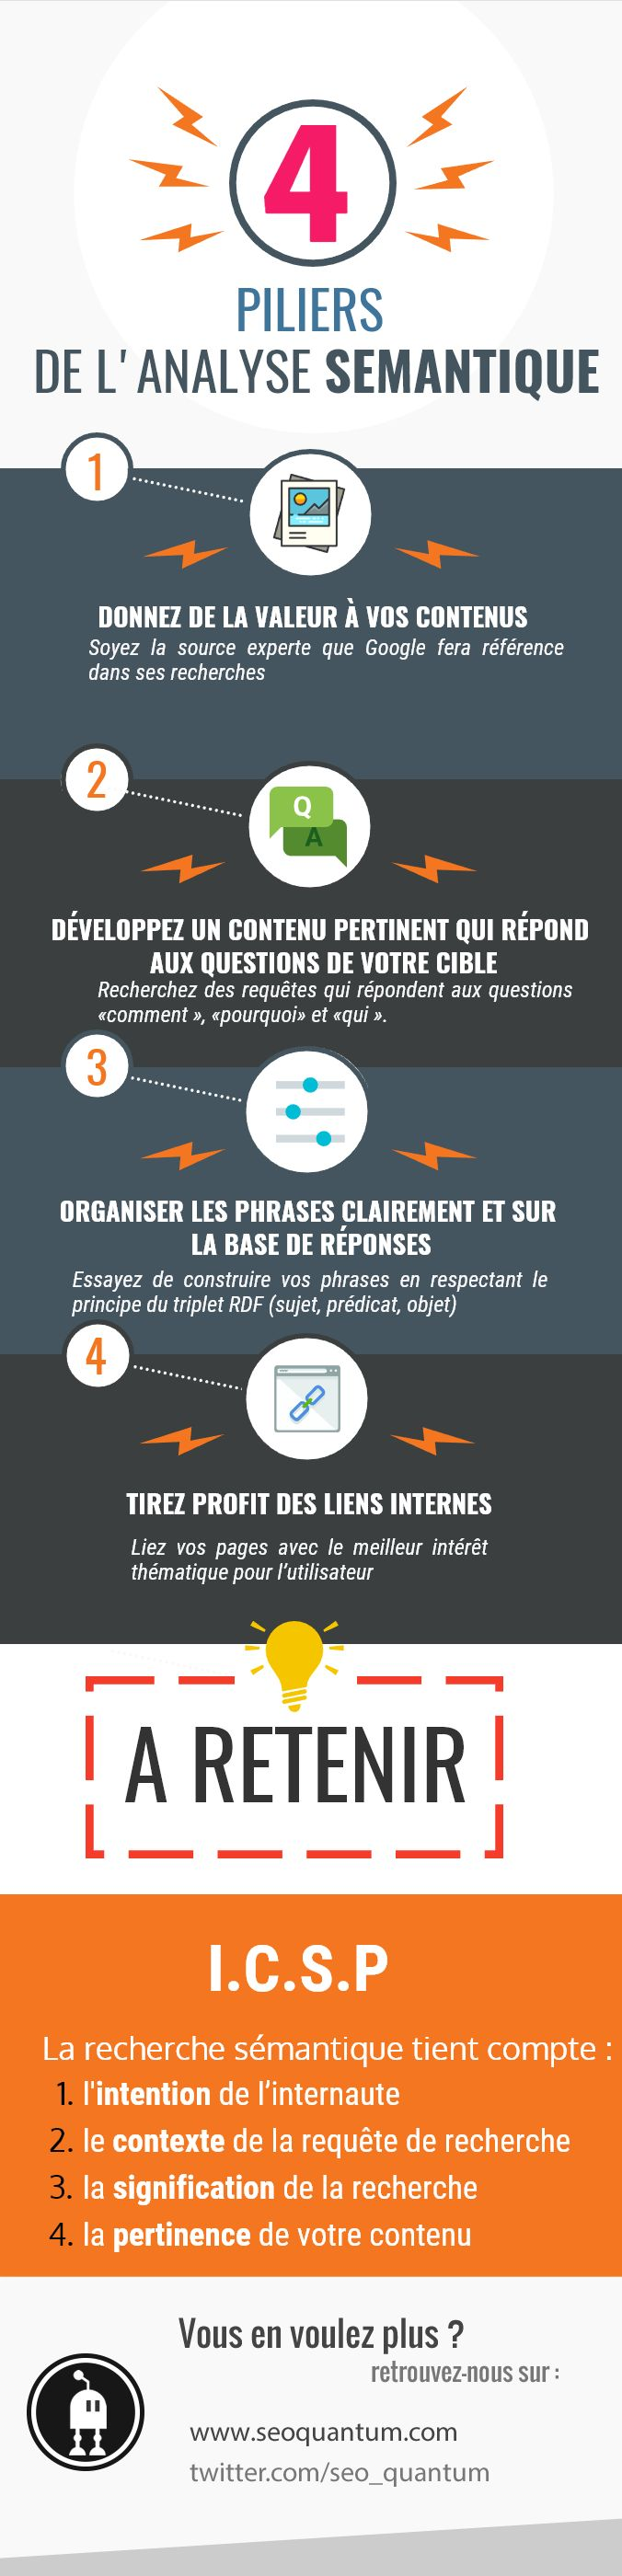 infographie-analyse-semantique